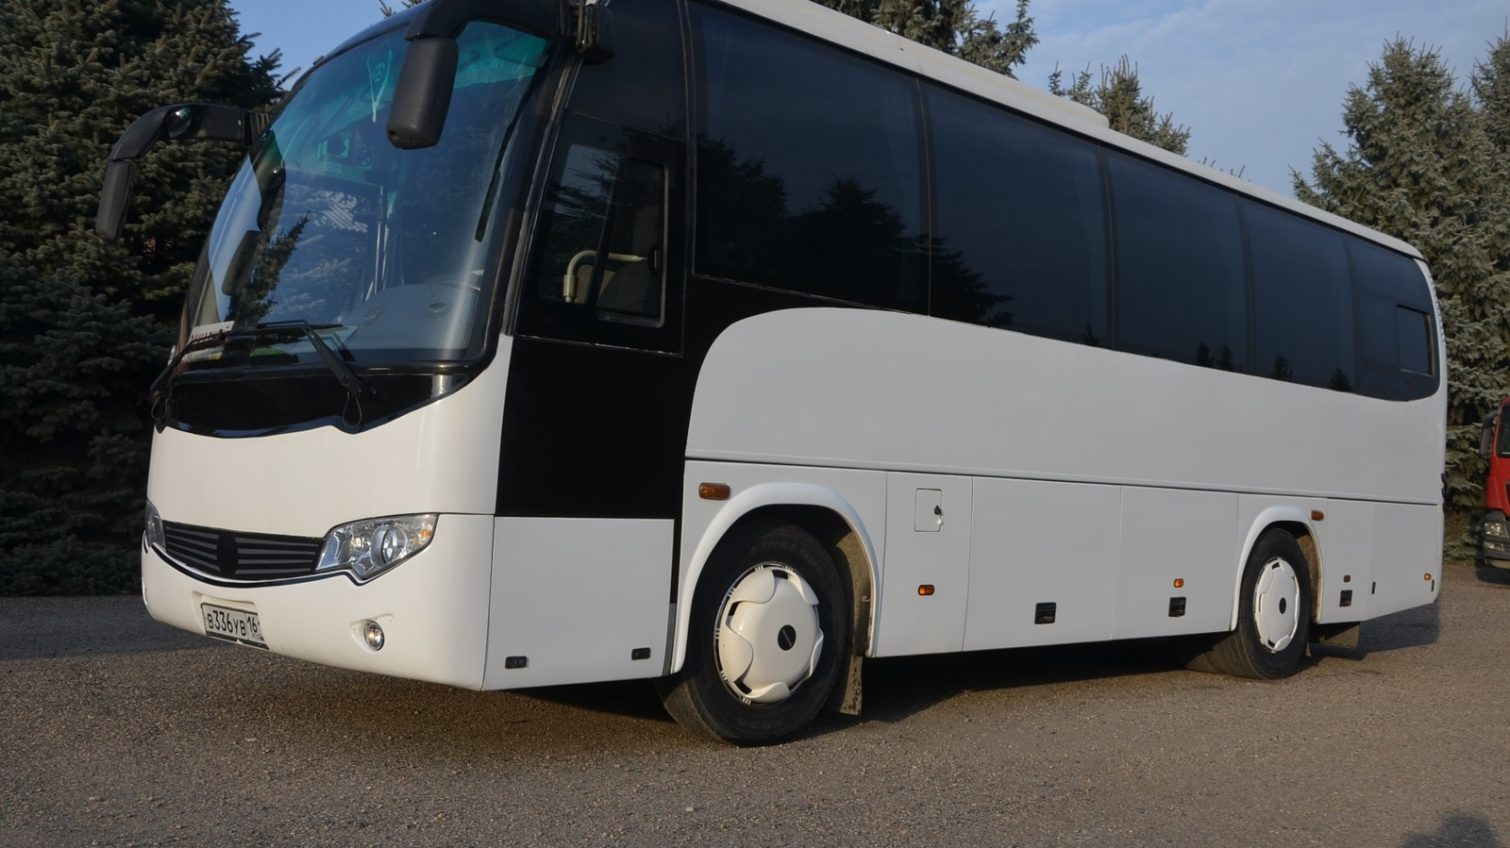 Карантин: BlaBlaCar прекращает автобусные маршруты «фото»